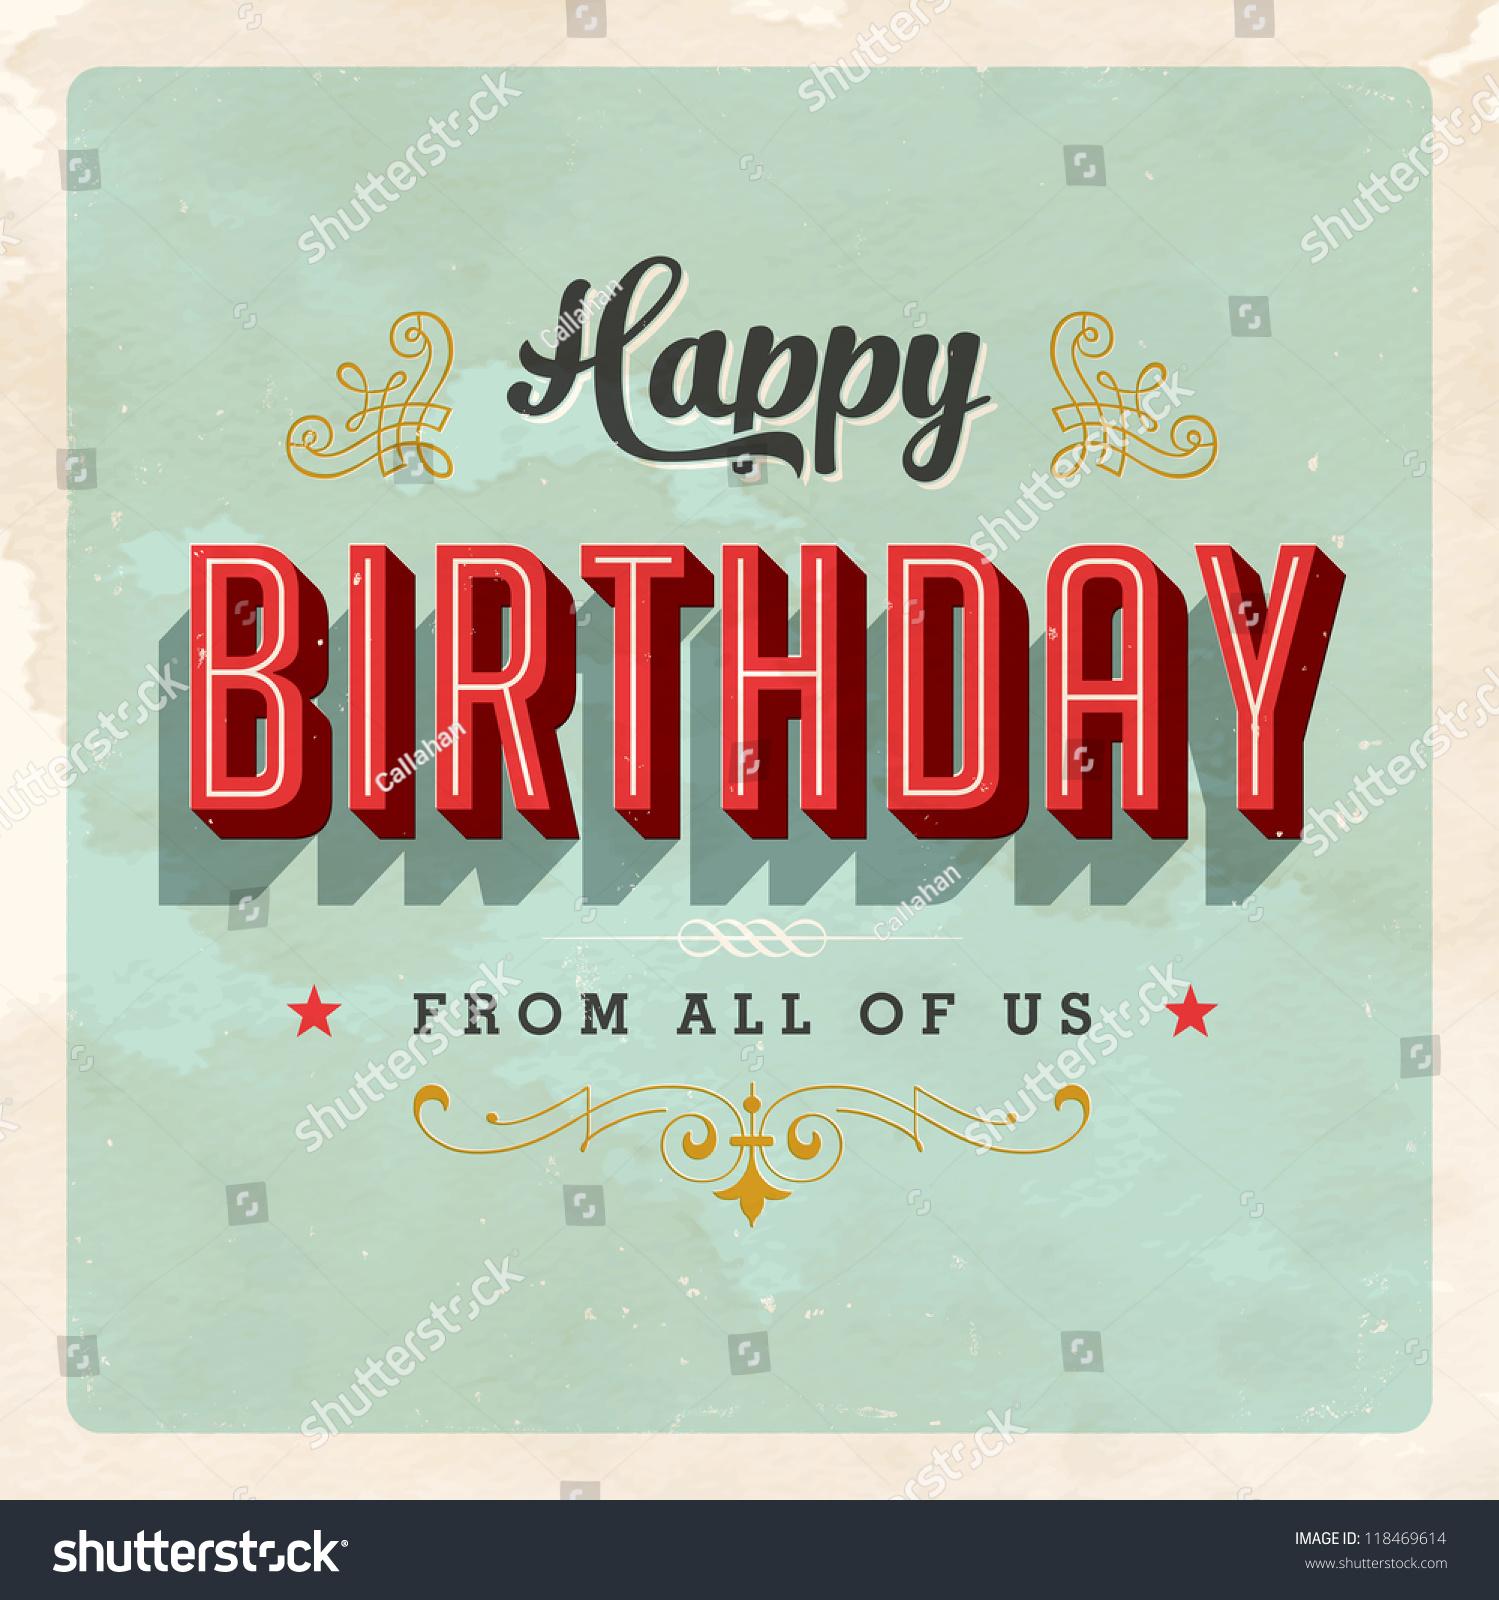 vintage birthday card jpg version stock illustration, Birthday card